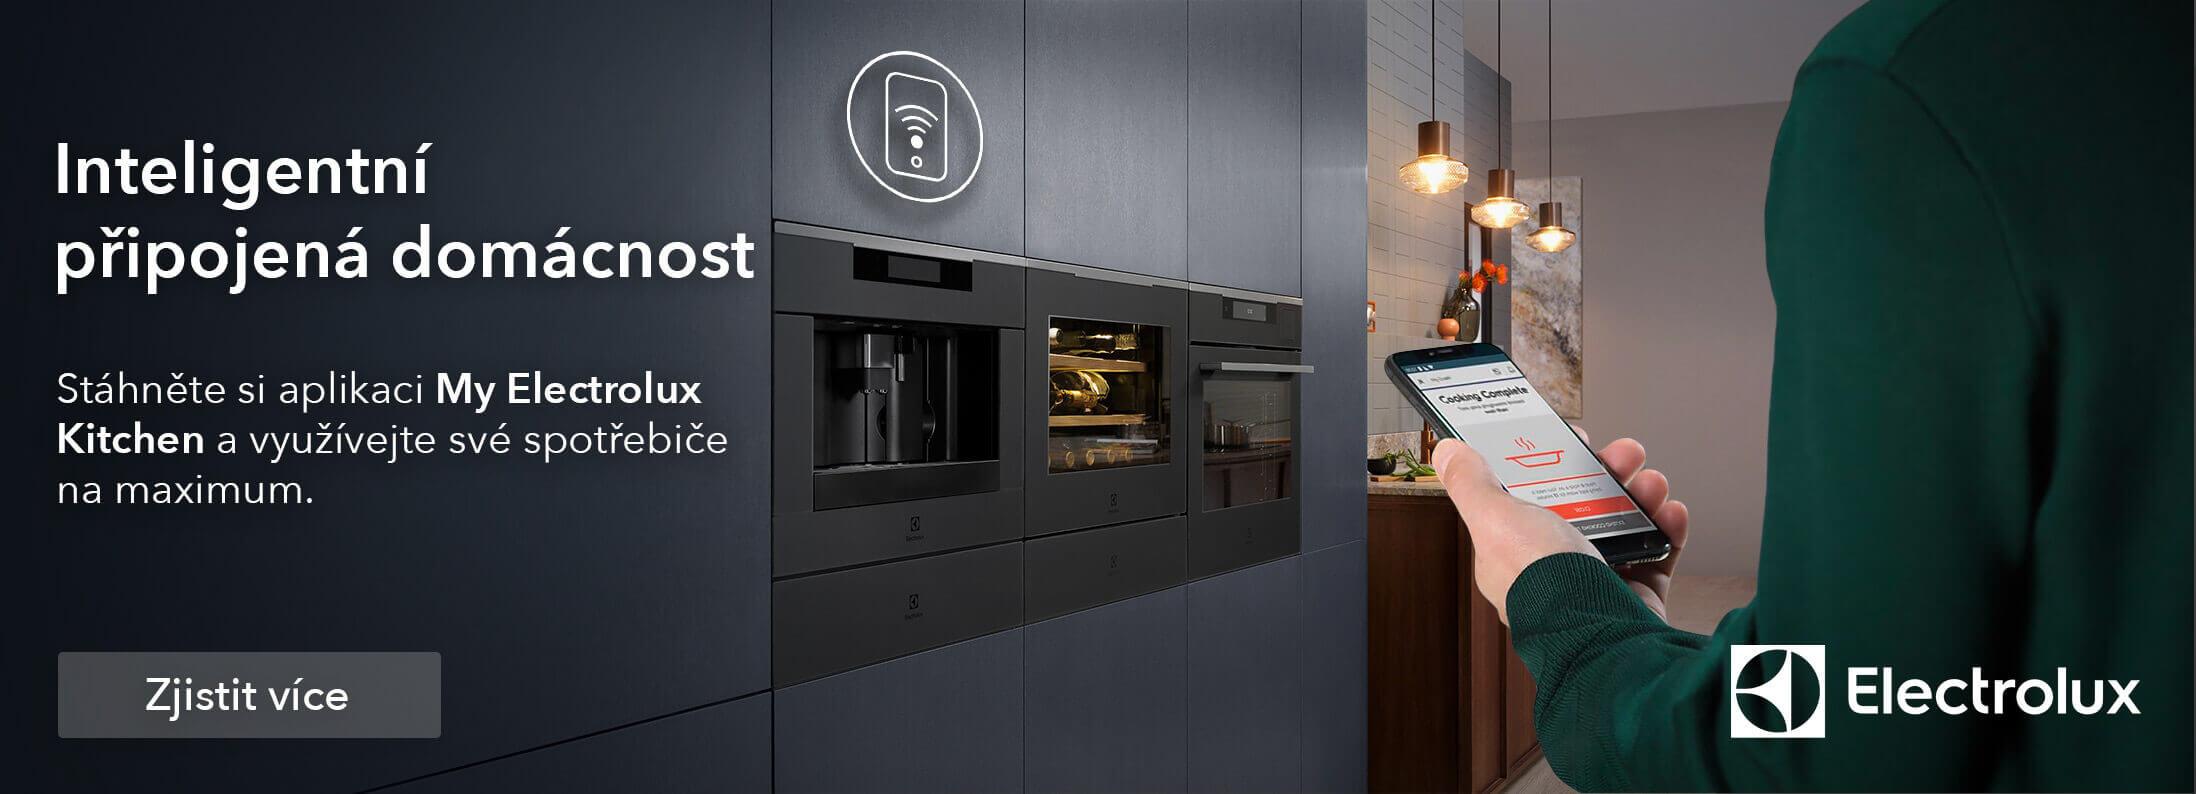 Electrolux - Aplikace My Electrolux Kitchen